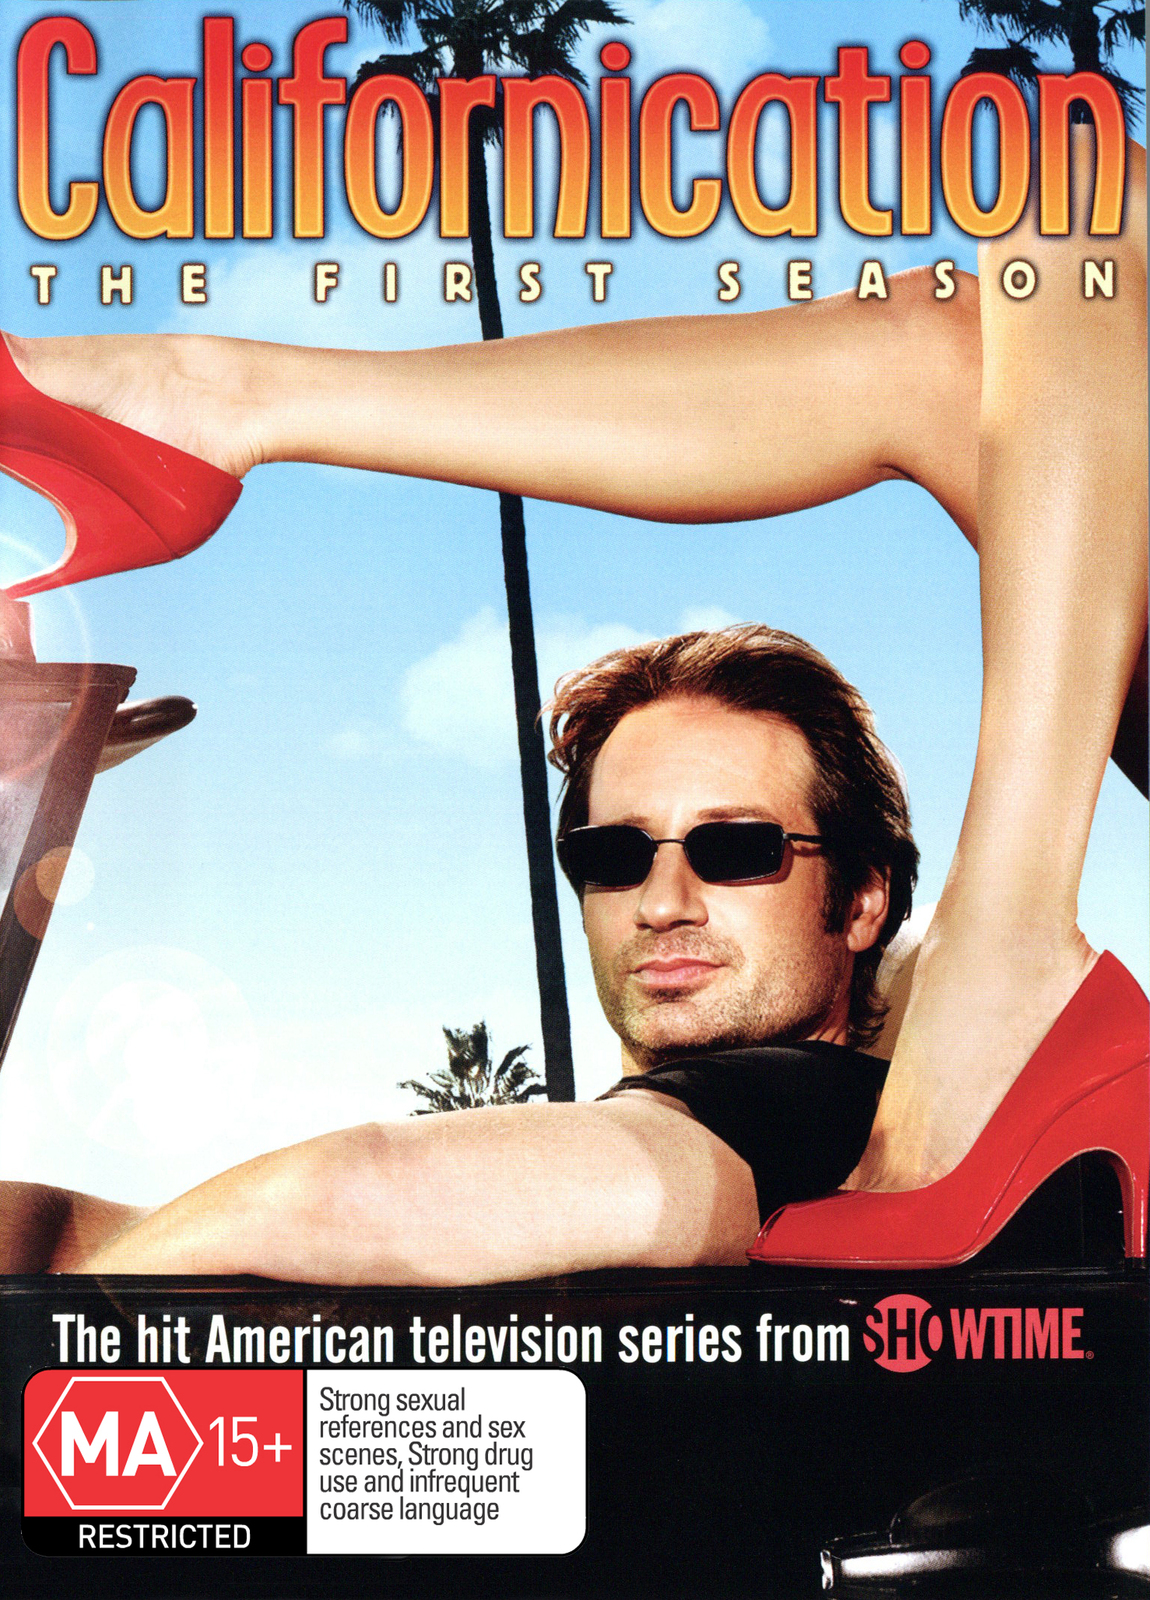 Californication - The 1st Season on DVD image